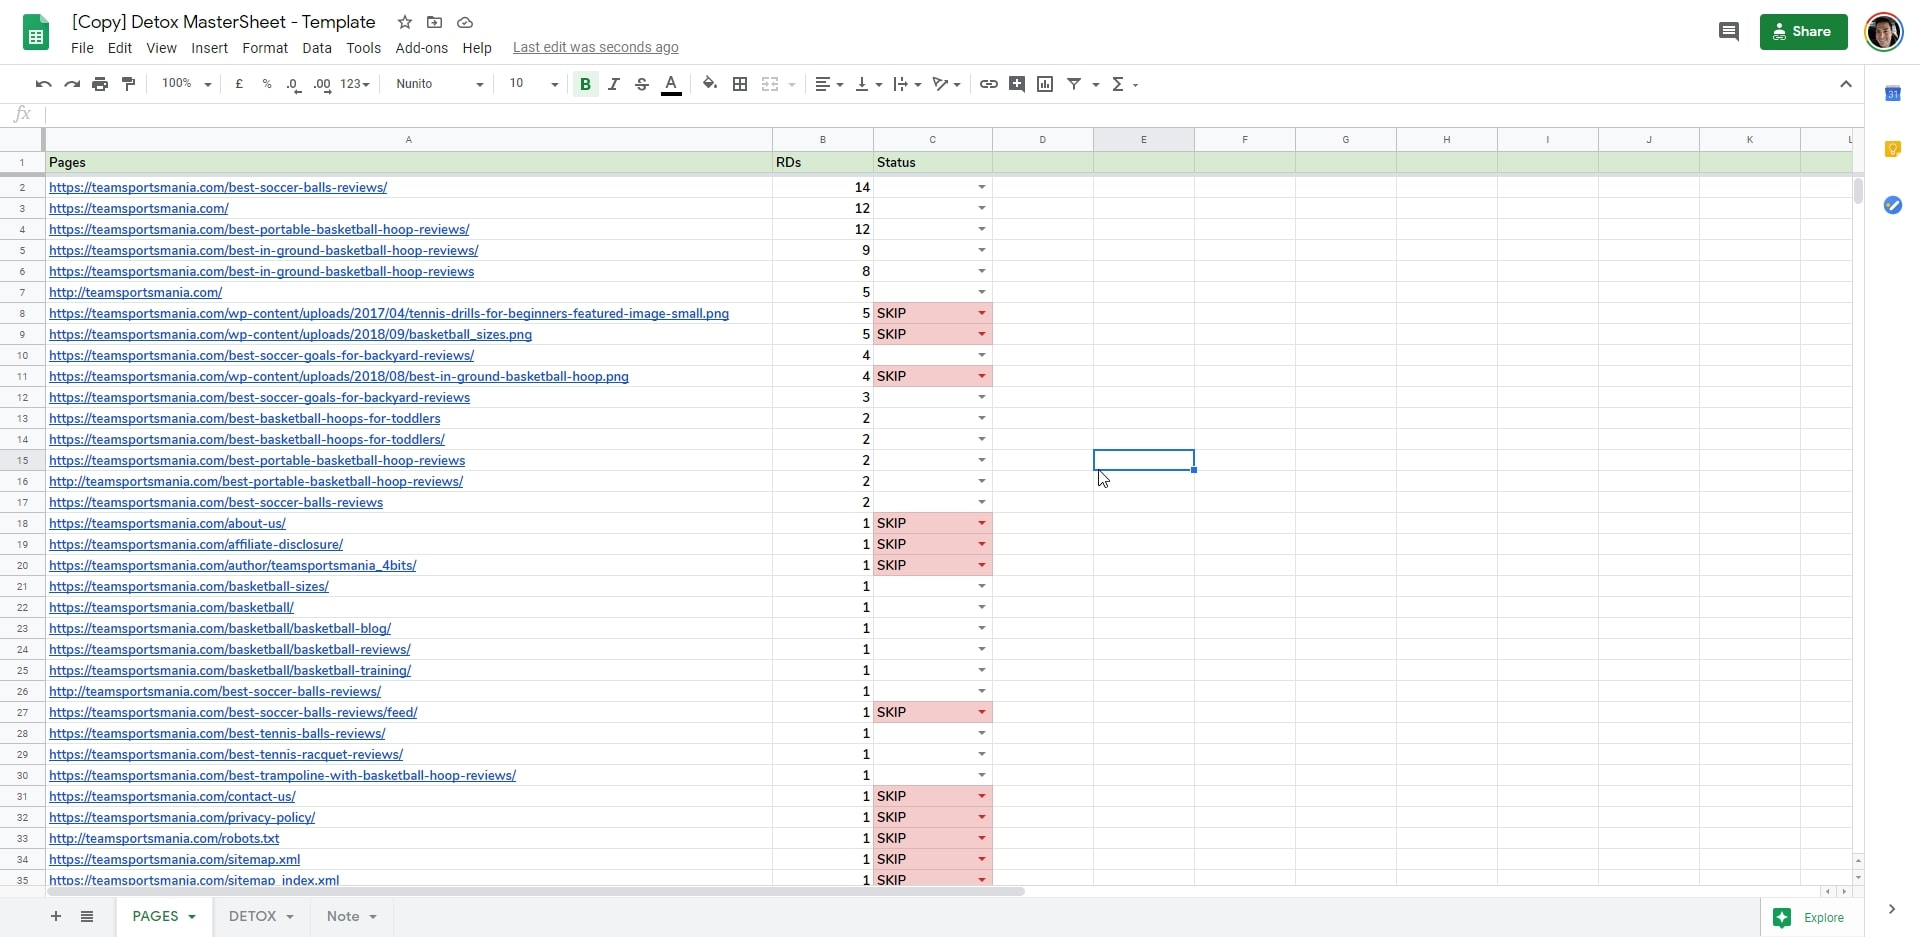 Detox Google Sheets - Skip Pages